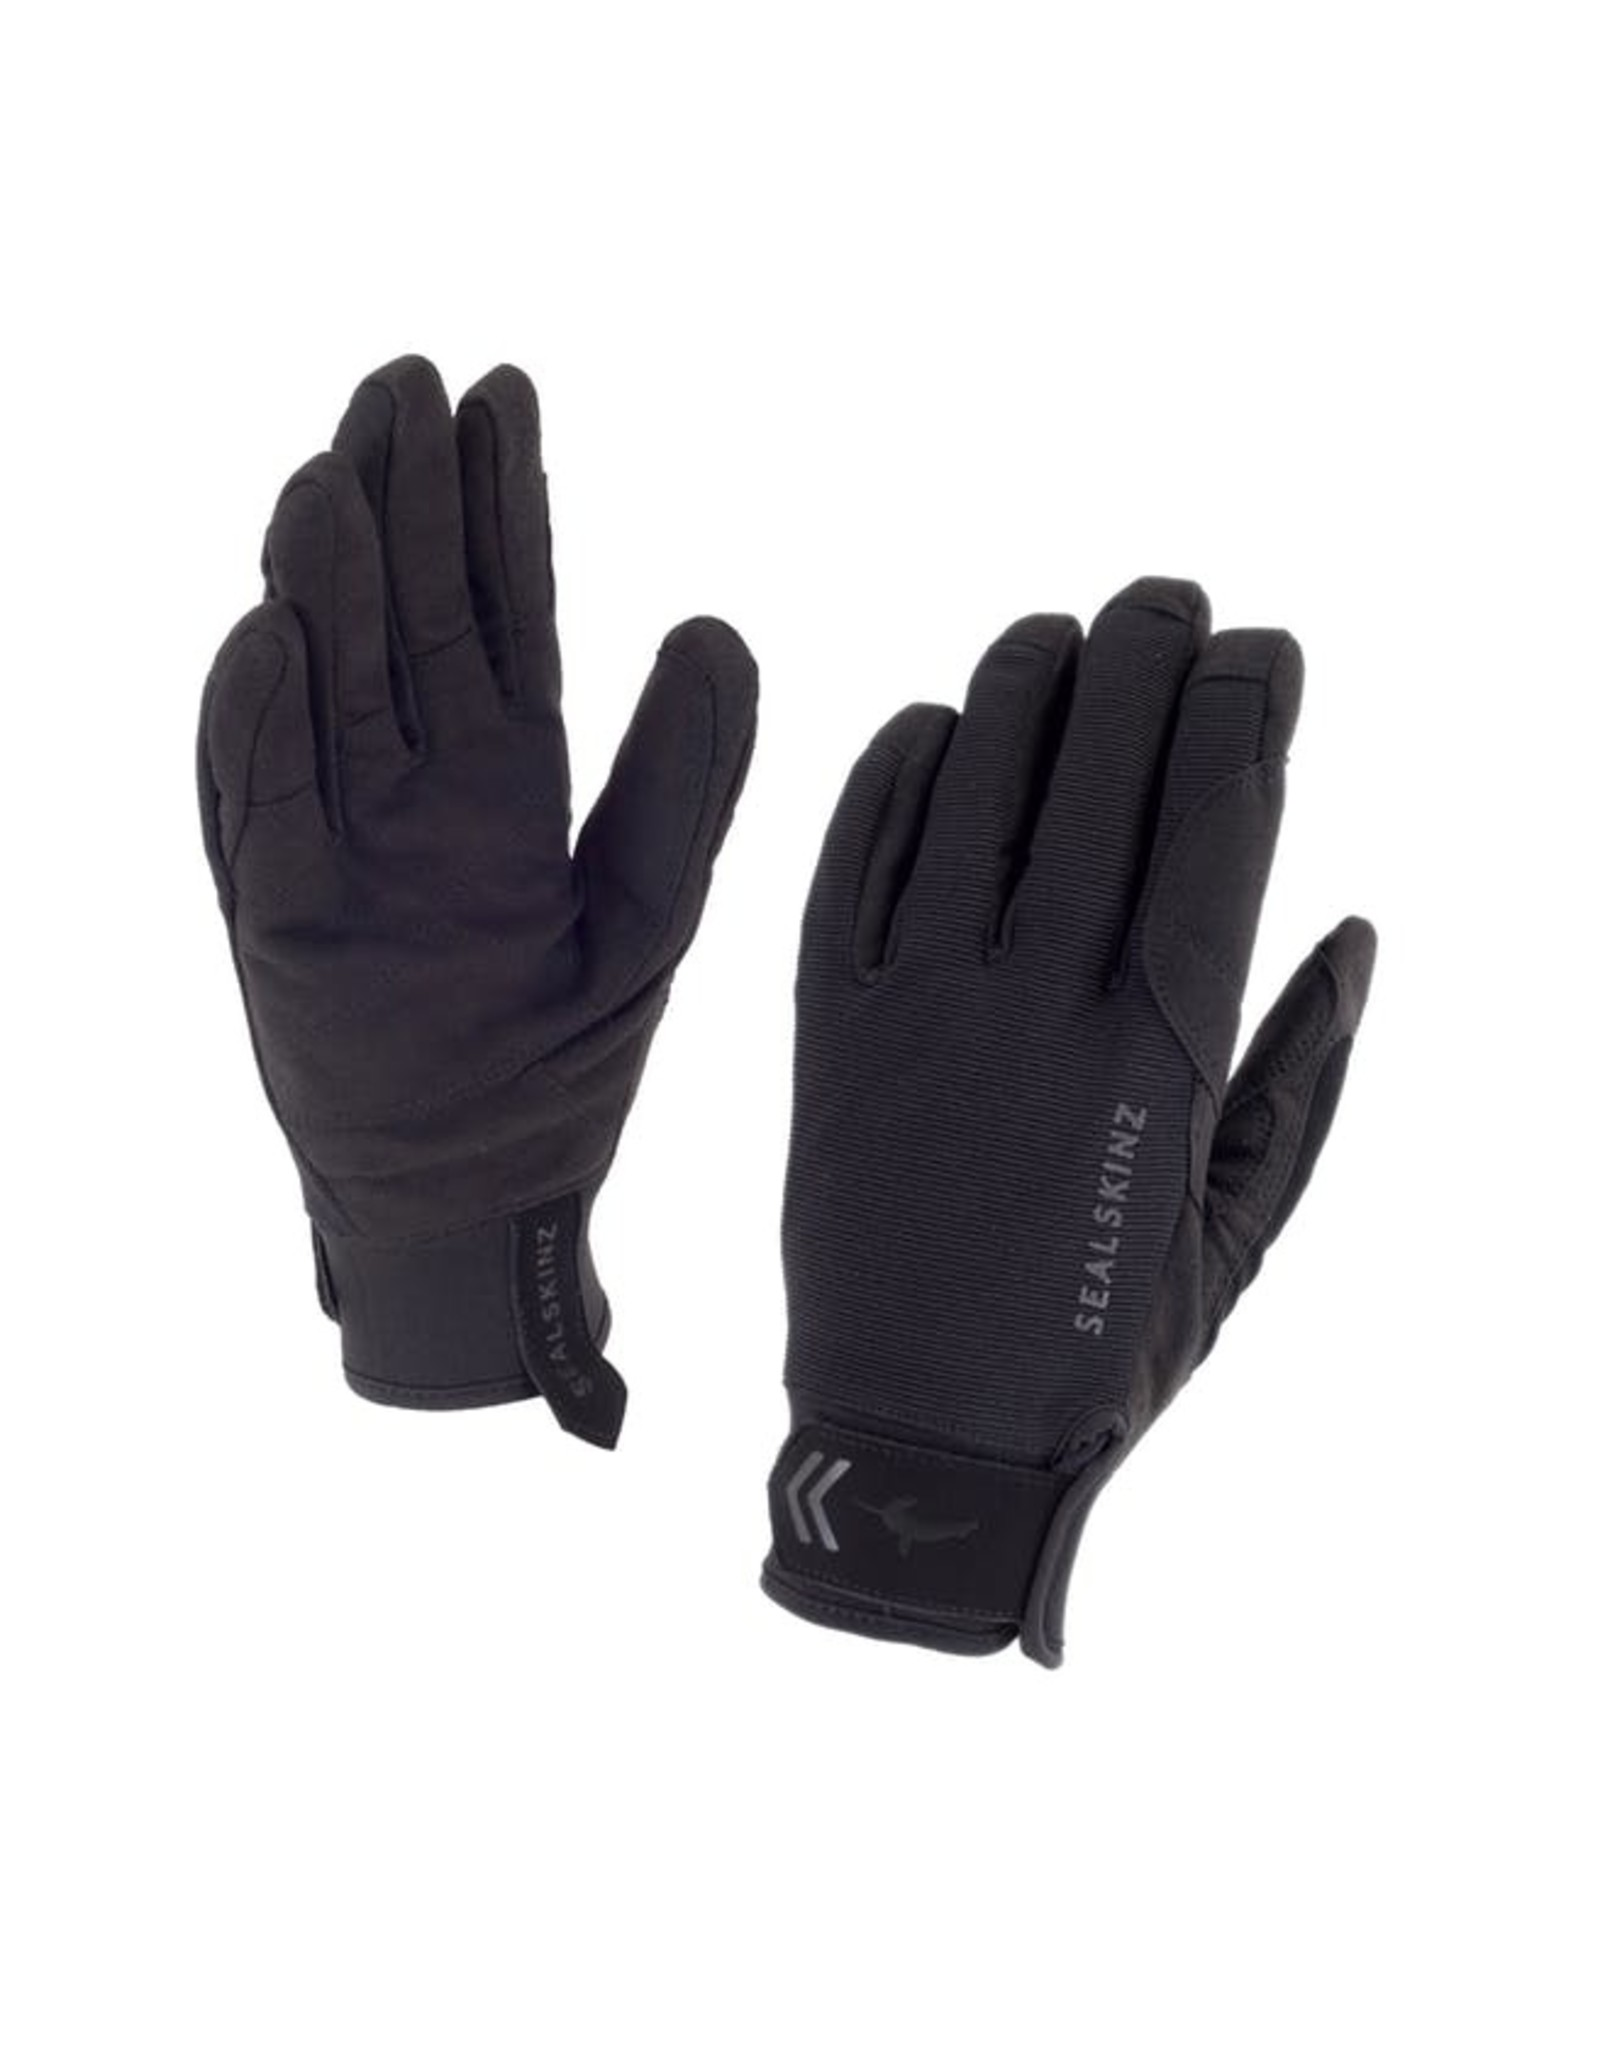 Sealskinz - Dragon Eye Road Gloves - Black